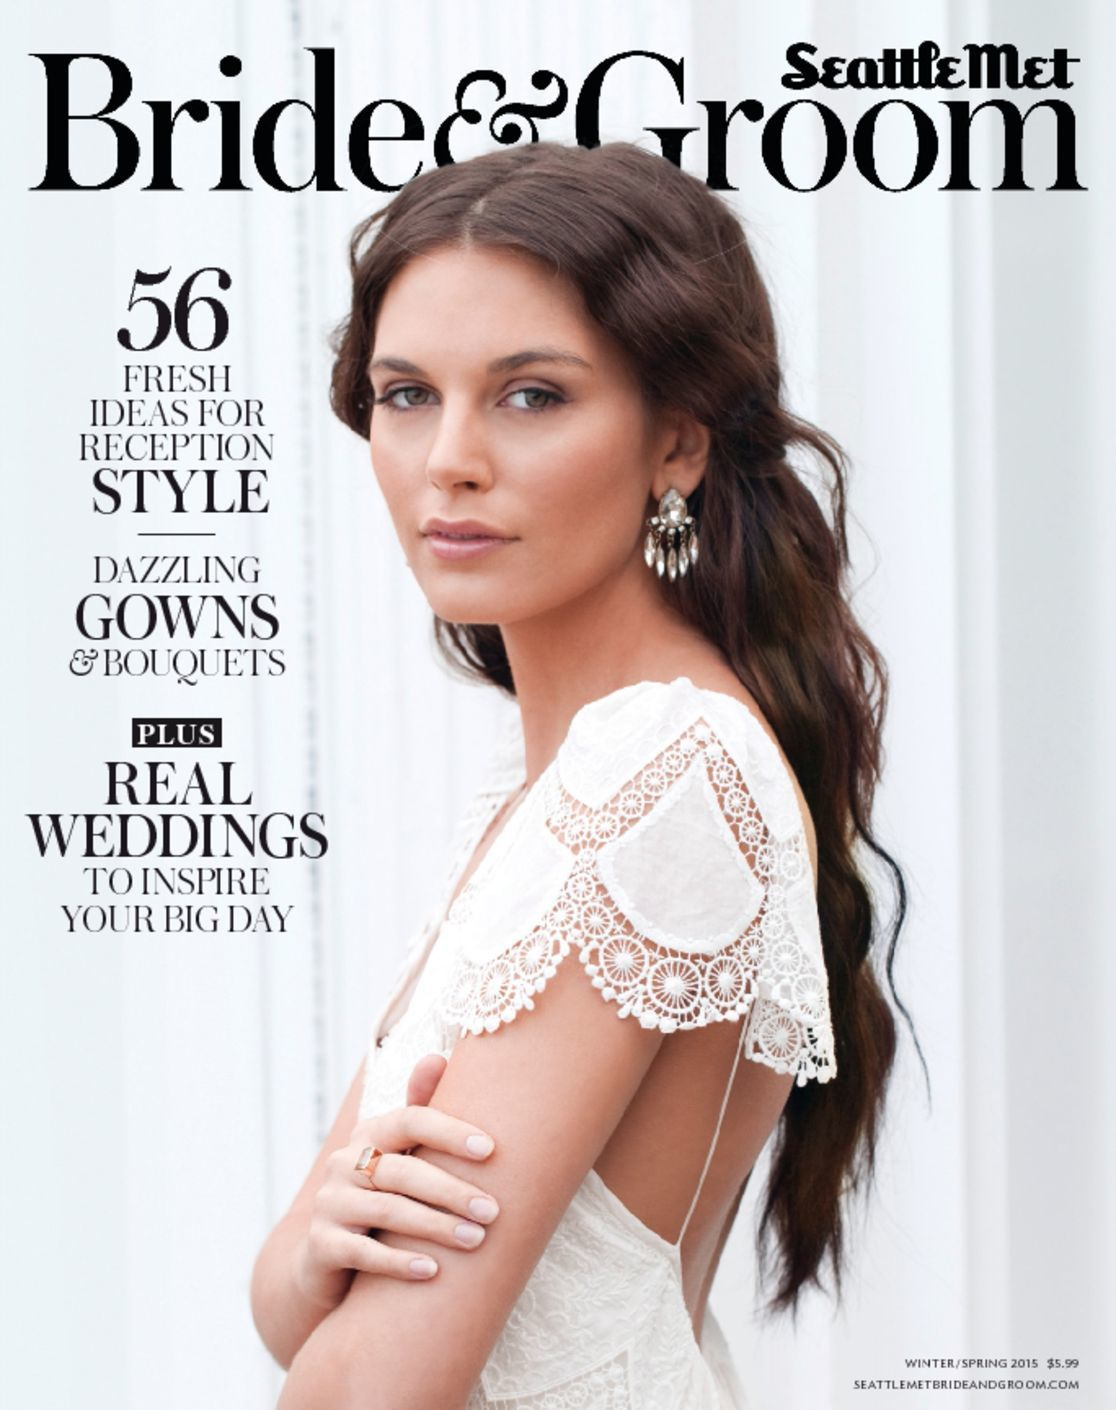 Bride Seattle 42